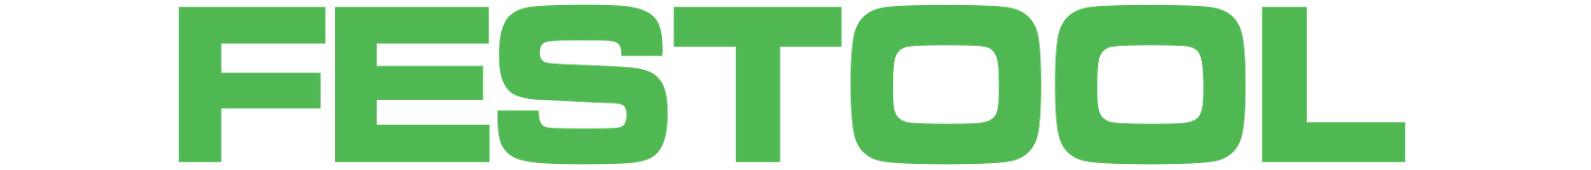 Originele Festool supercut multitool zagen